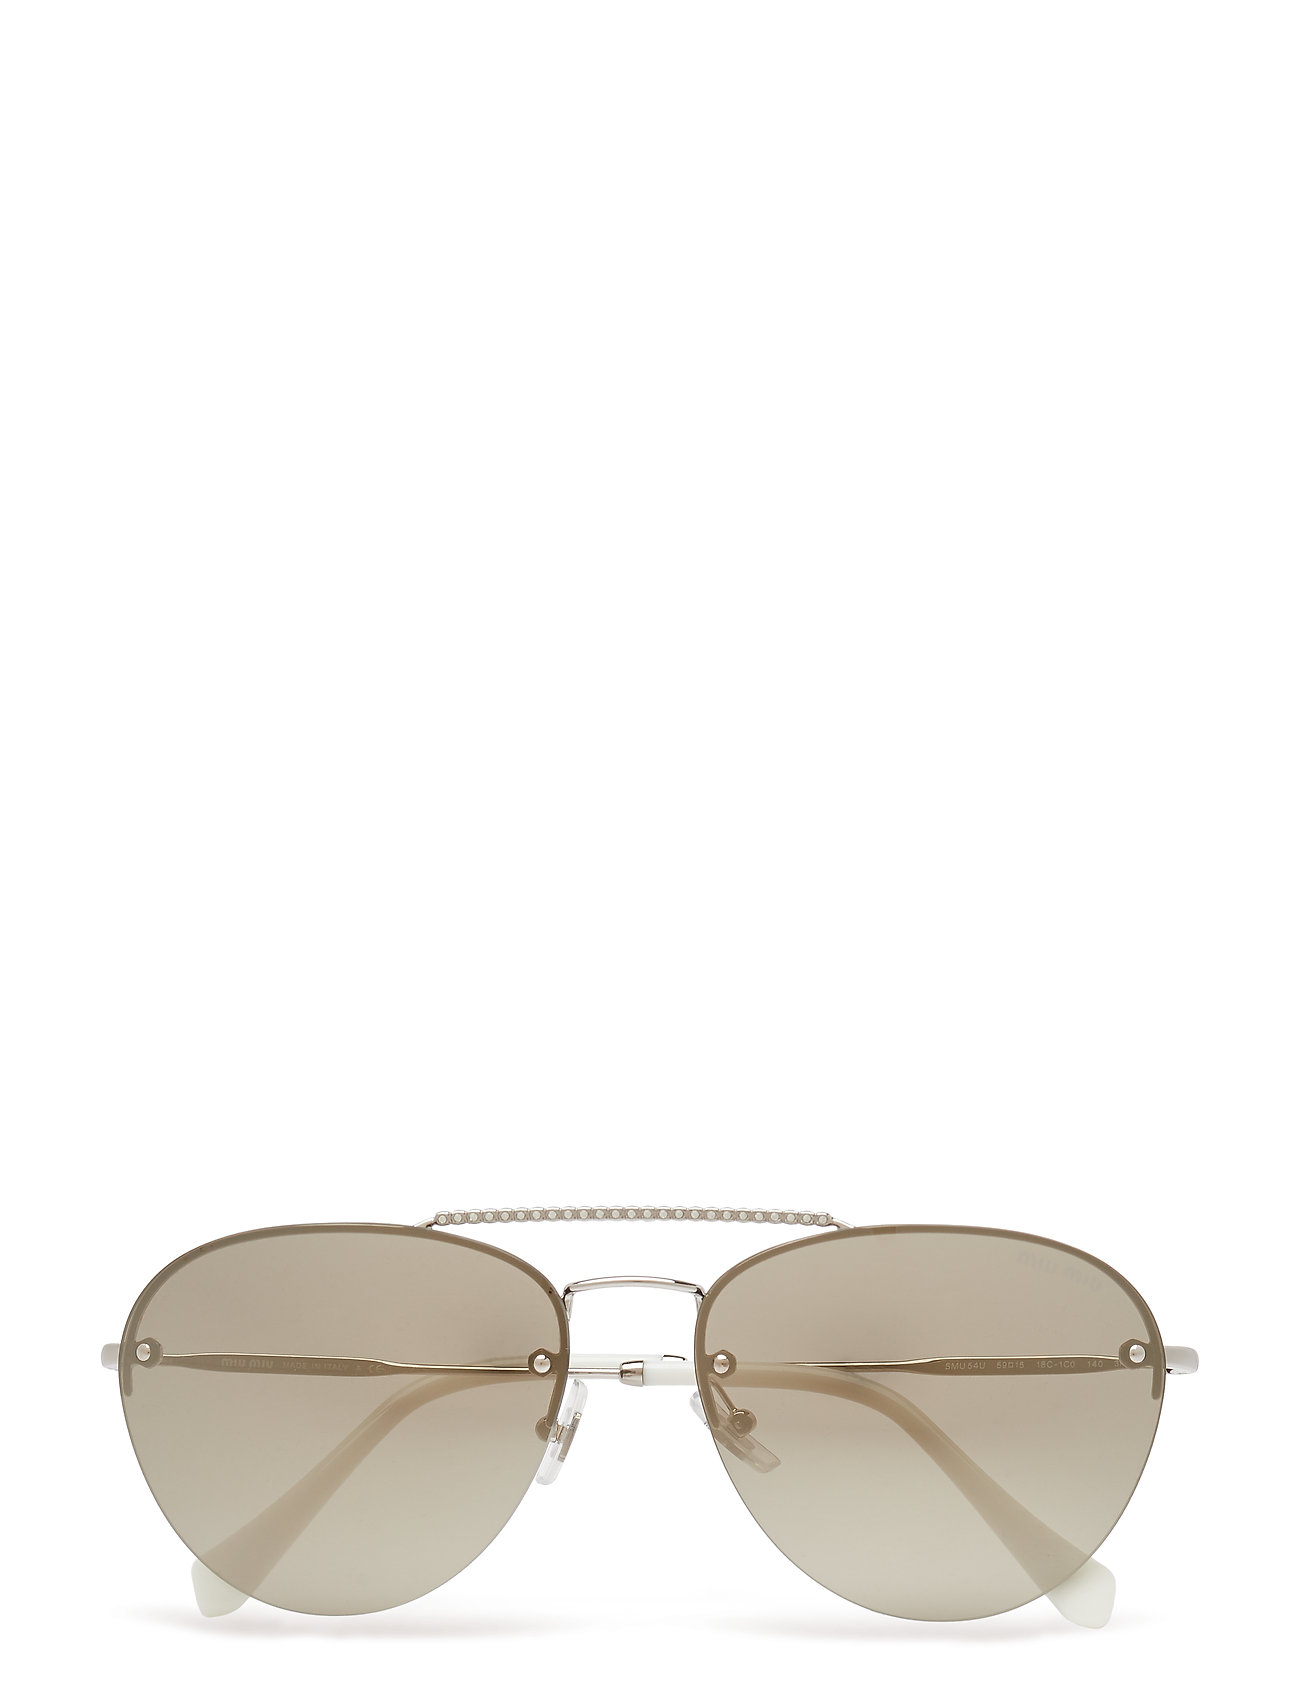 0mu 54us Pilottilasit Aurinkolasit Kulta Miu Miu Sunglasses